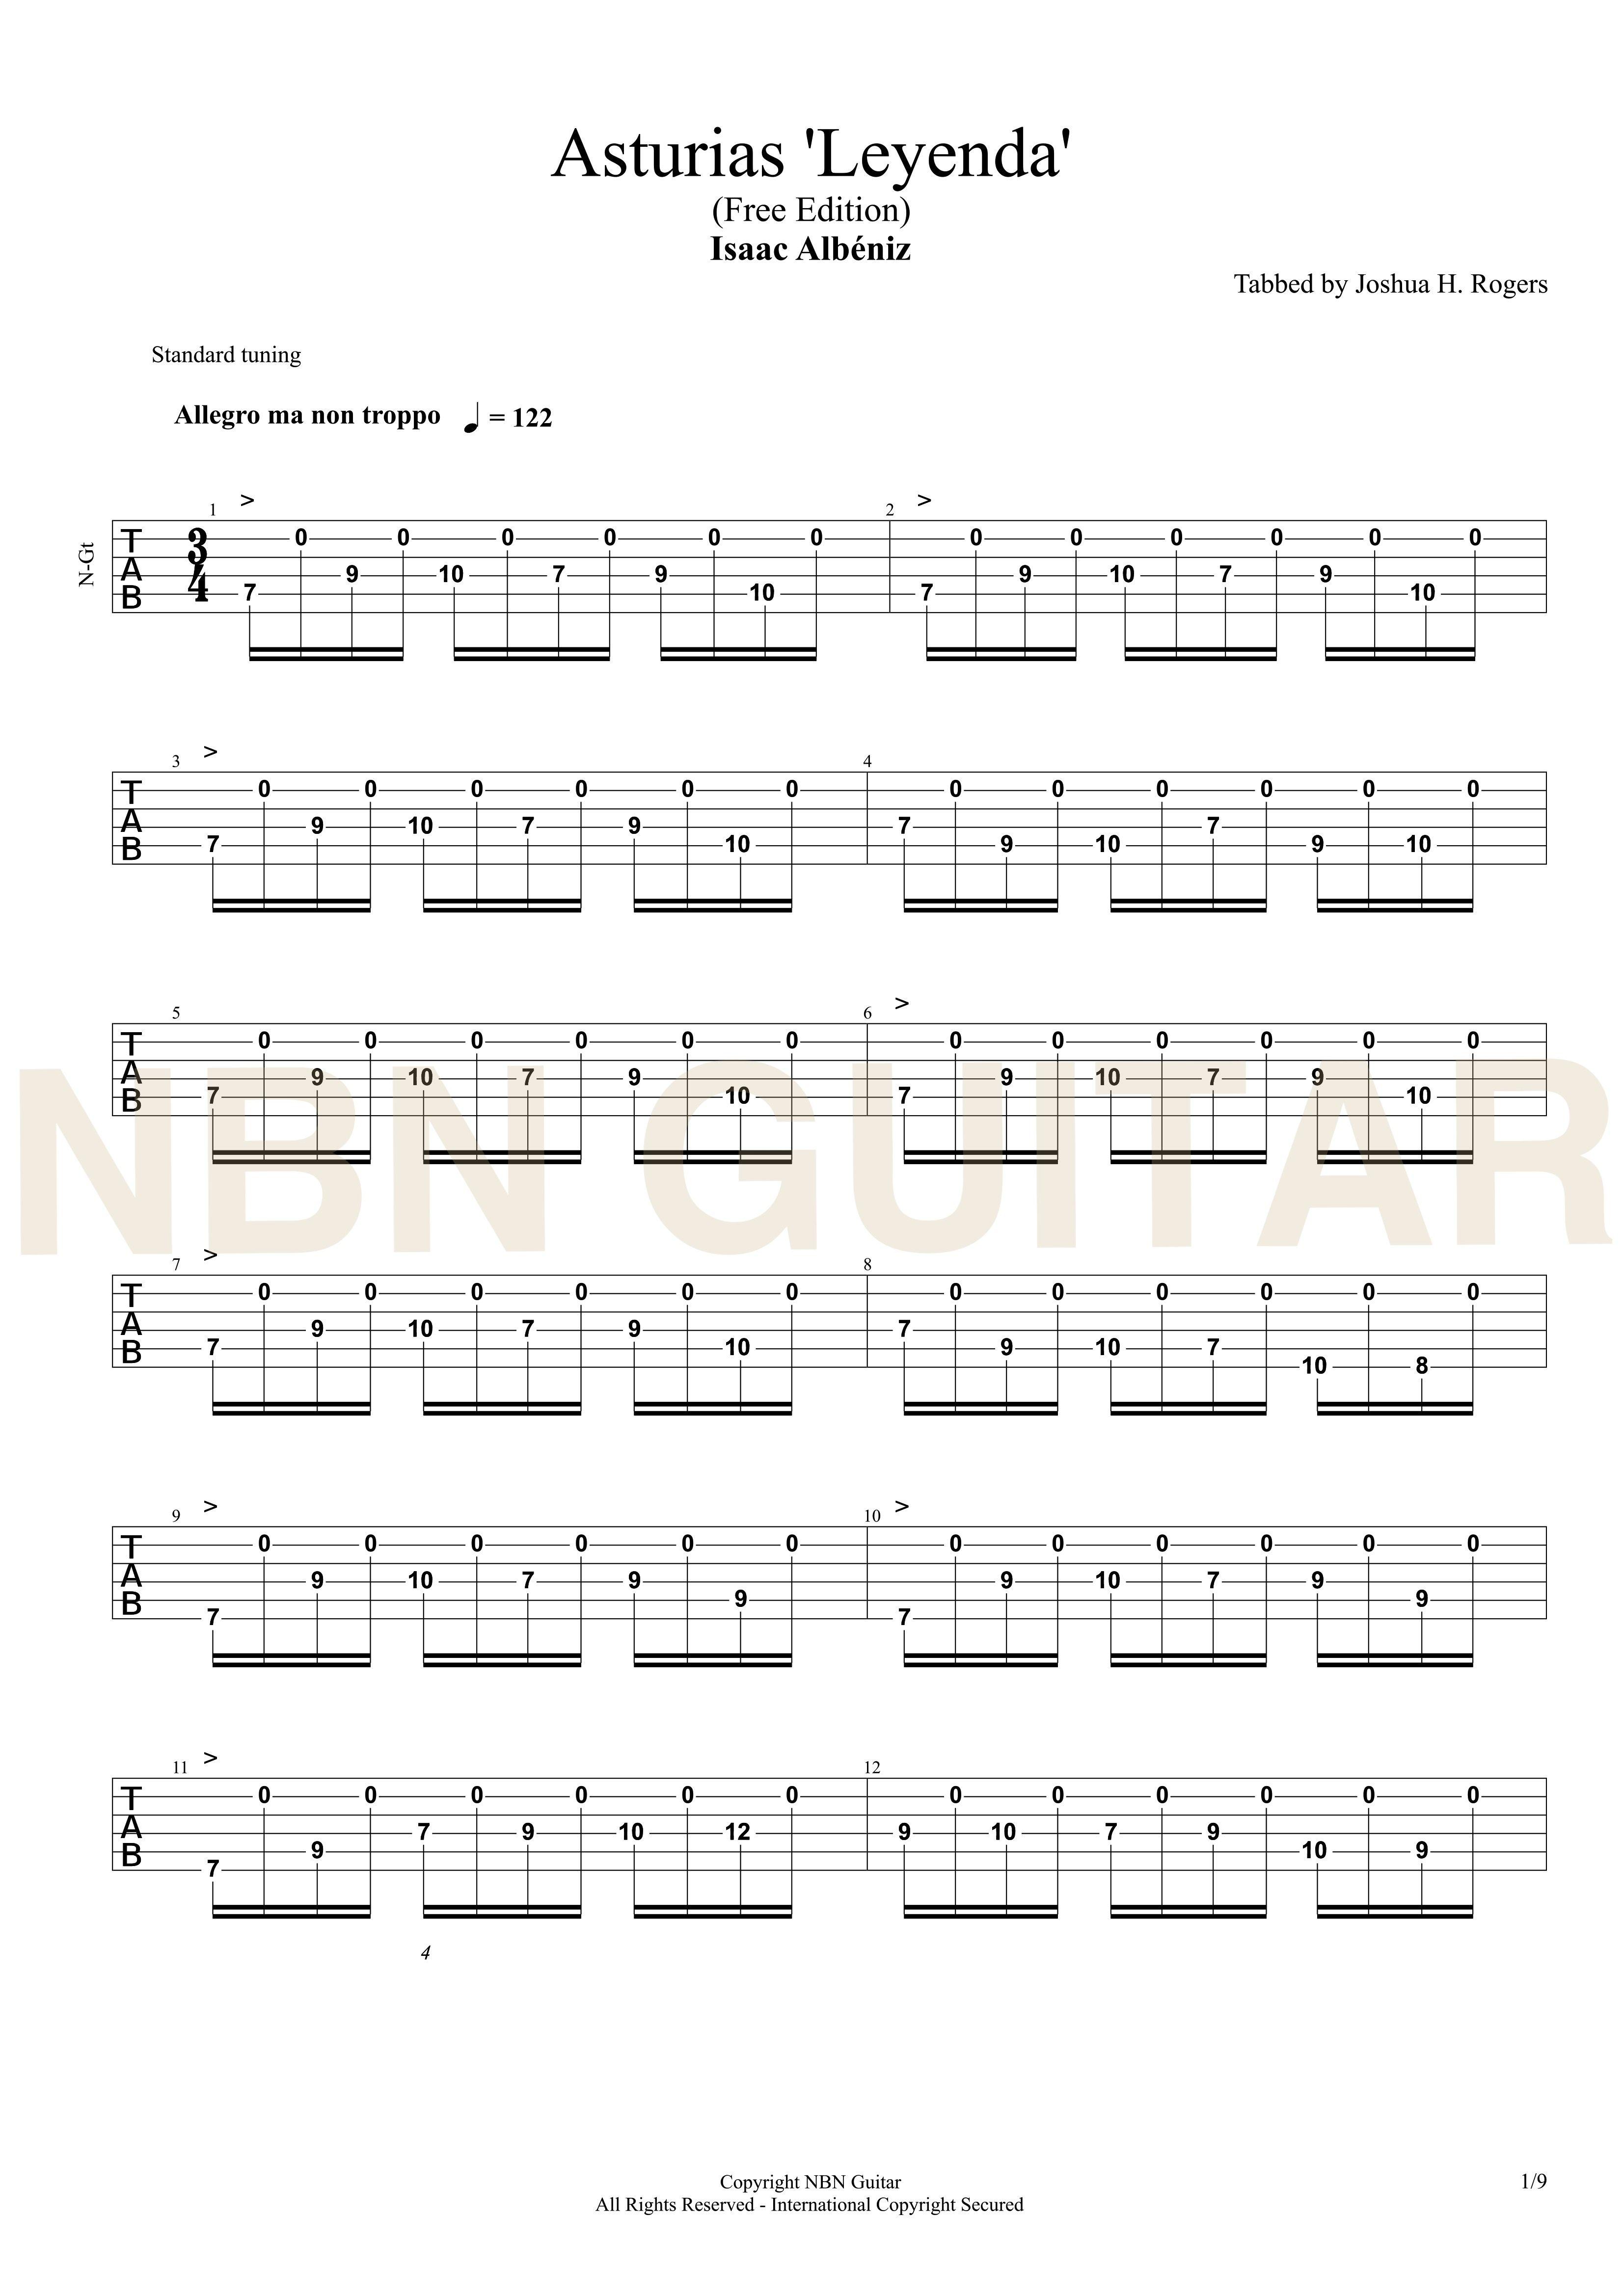 asturias free classical guitar tabs guitars partition guitare guitare musique. Black Bedroom Furniture Sets. Home Design Ideas